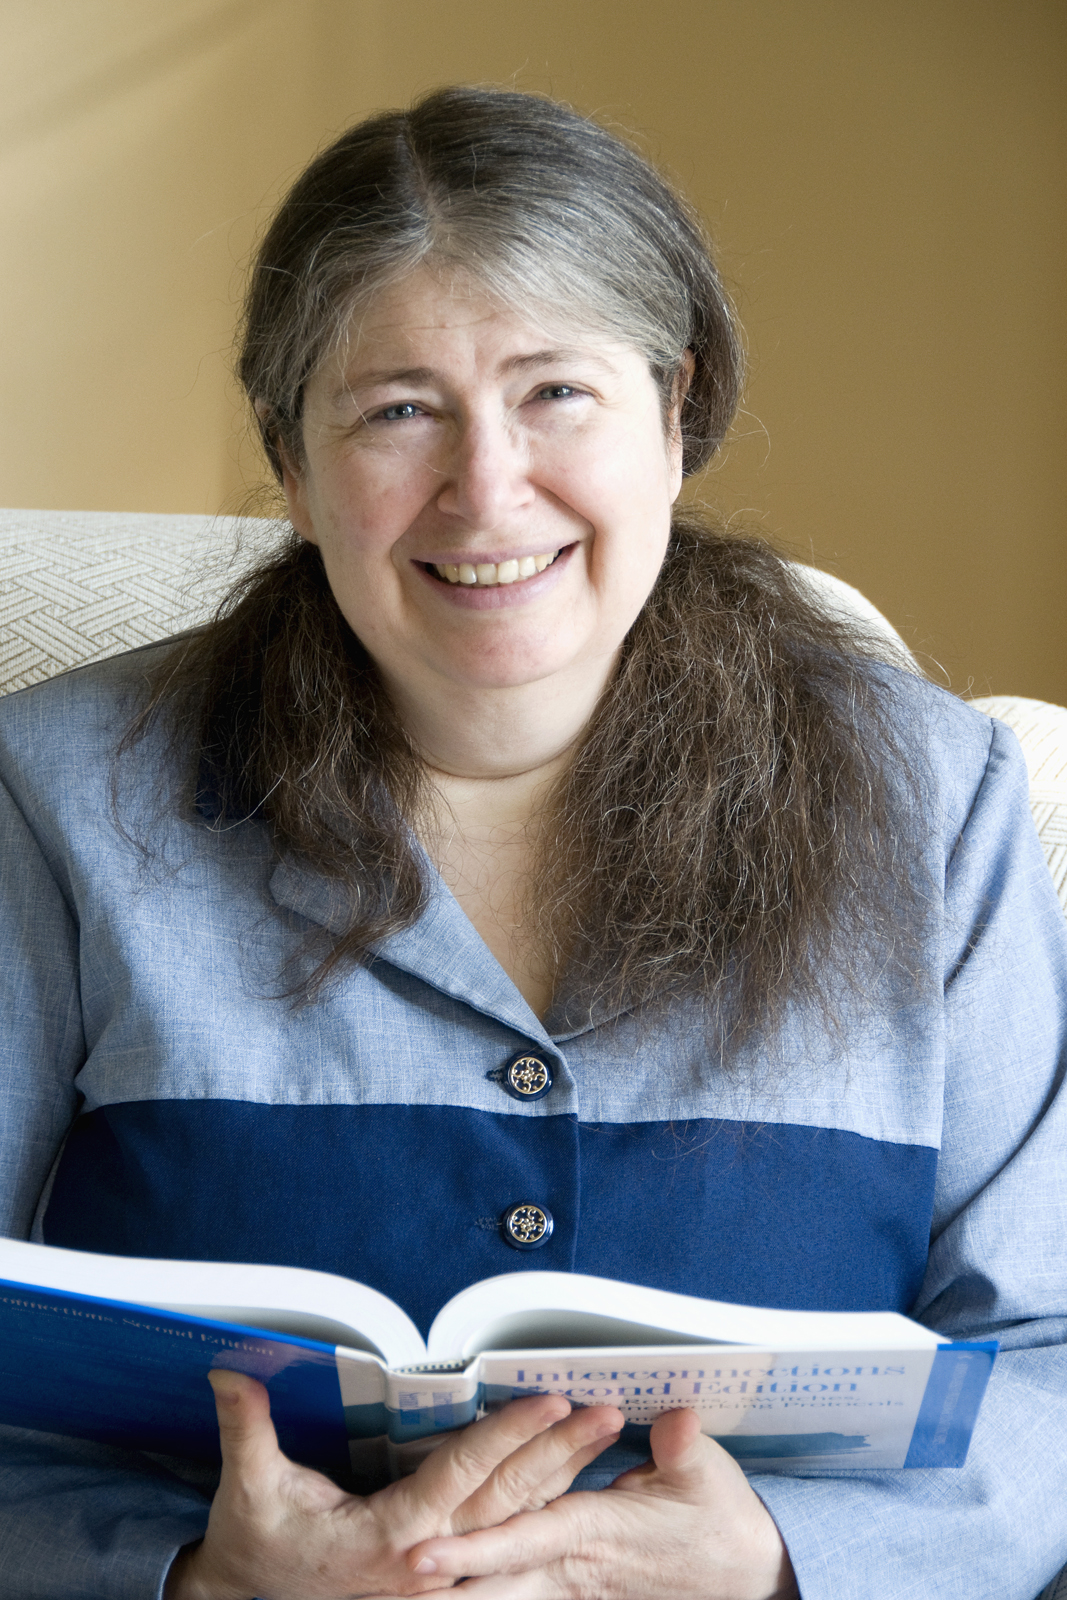 Radia Perlman 2009.jpg